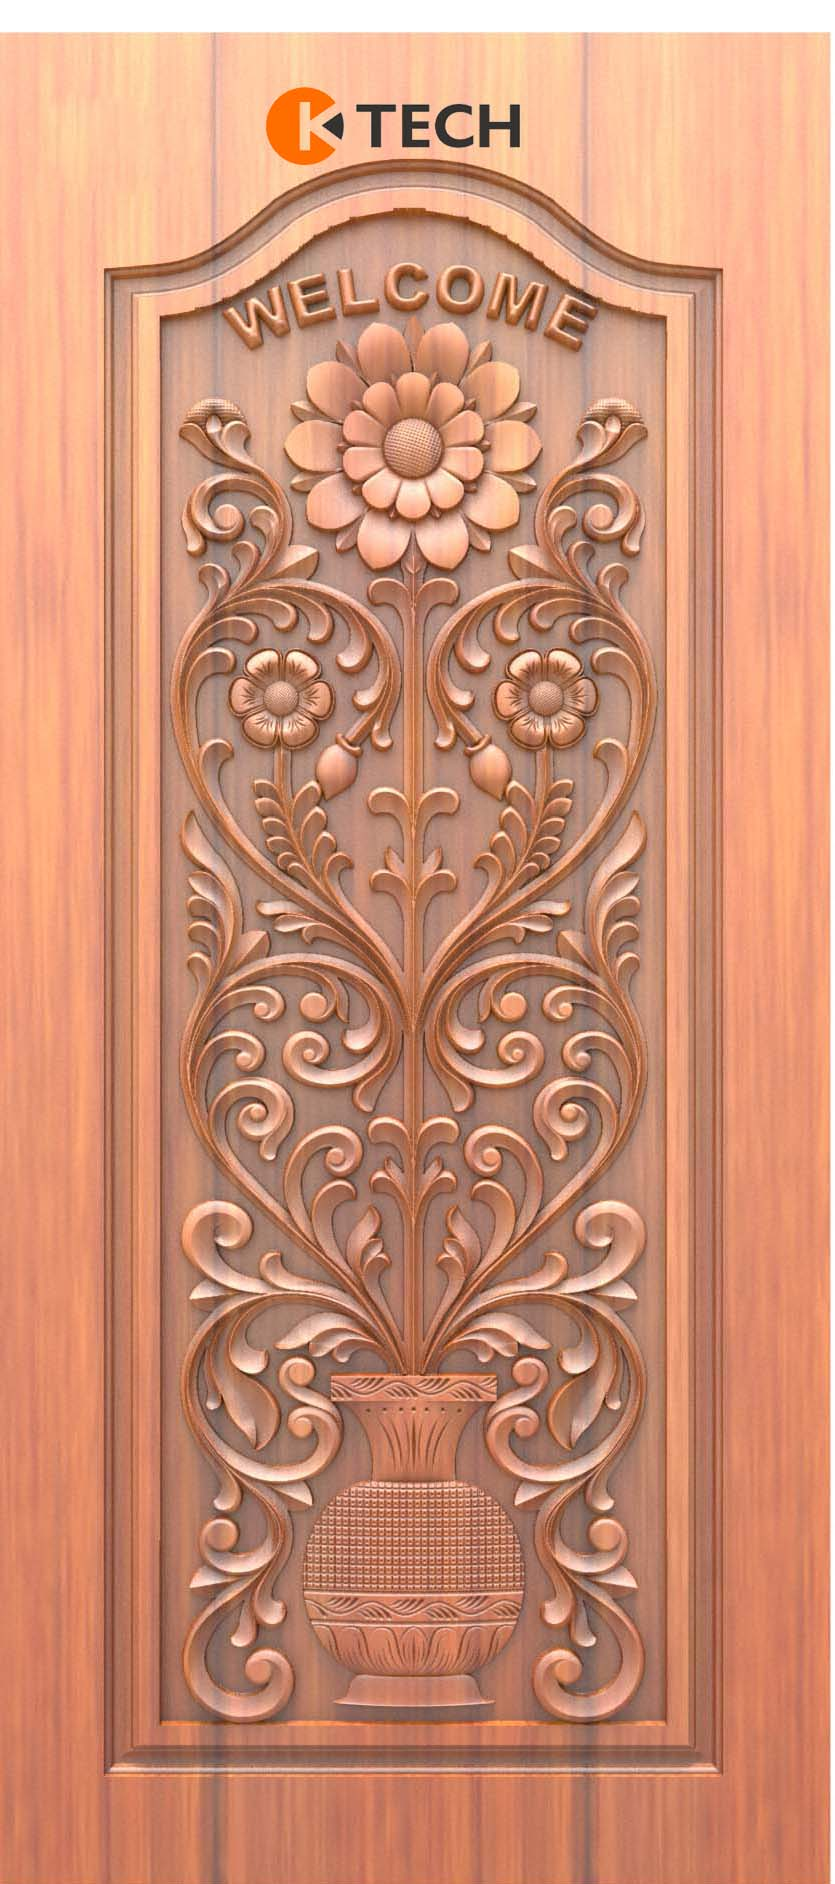 K-TECH CNC Doors Design 171